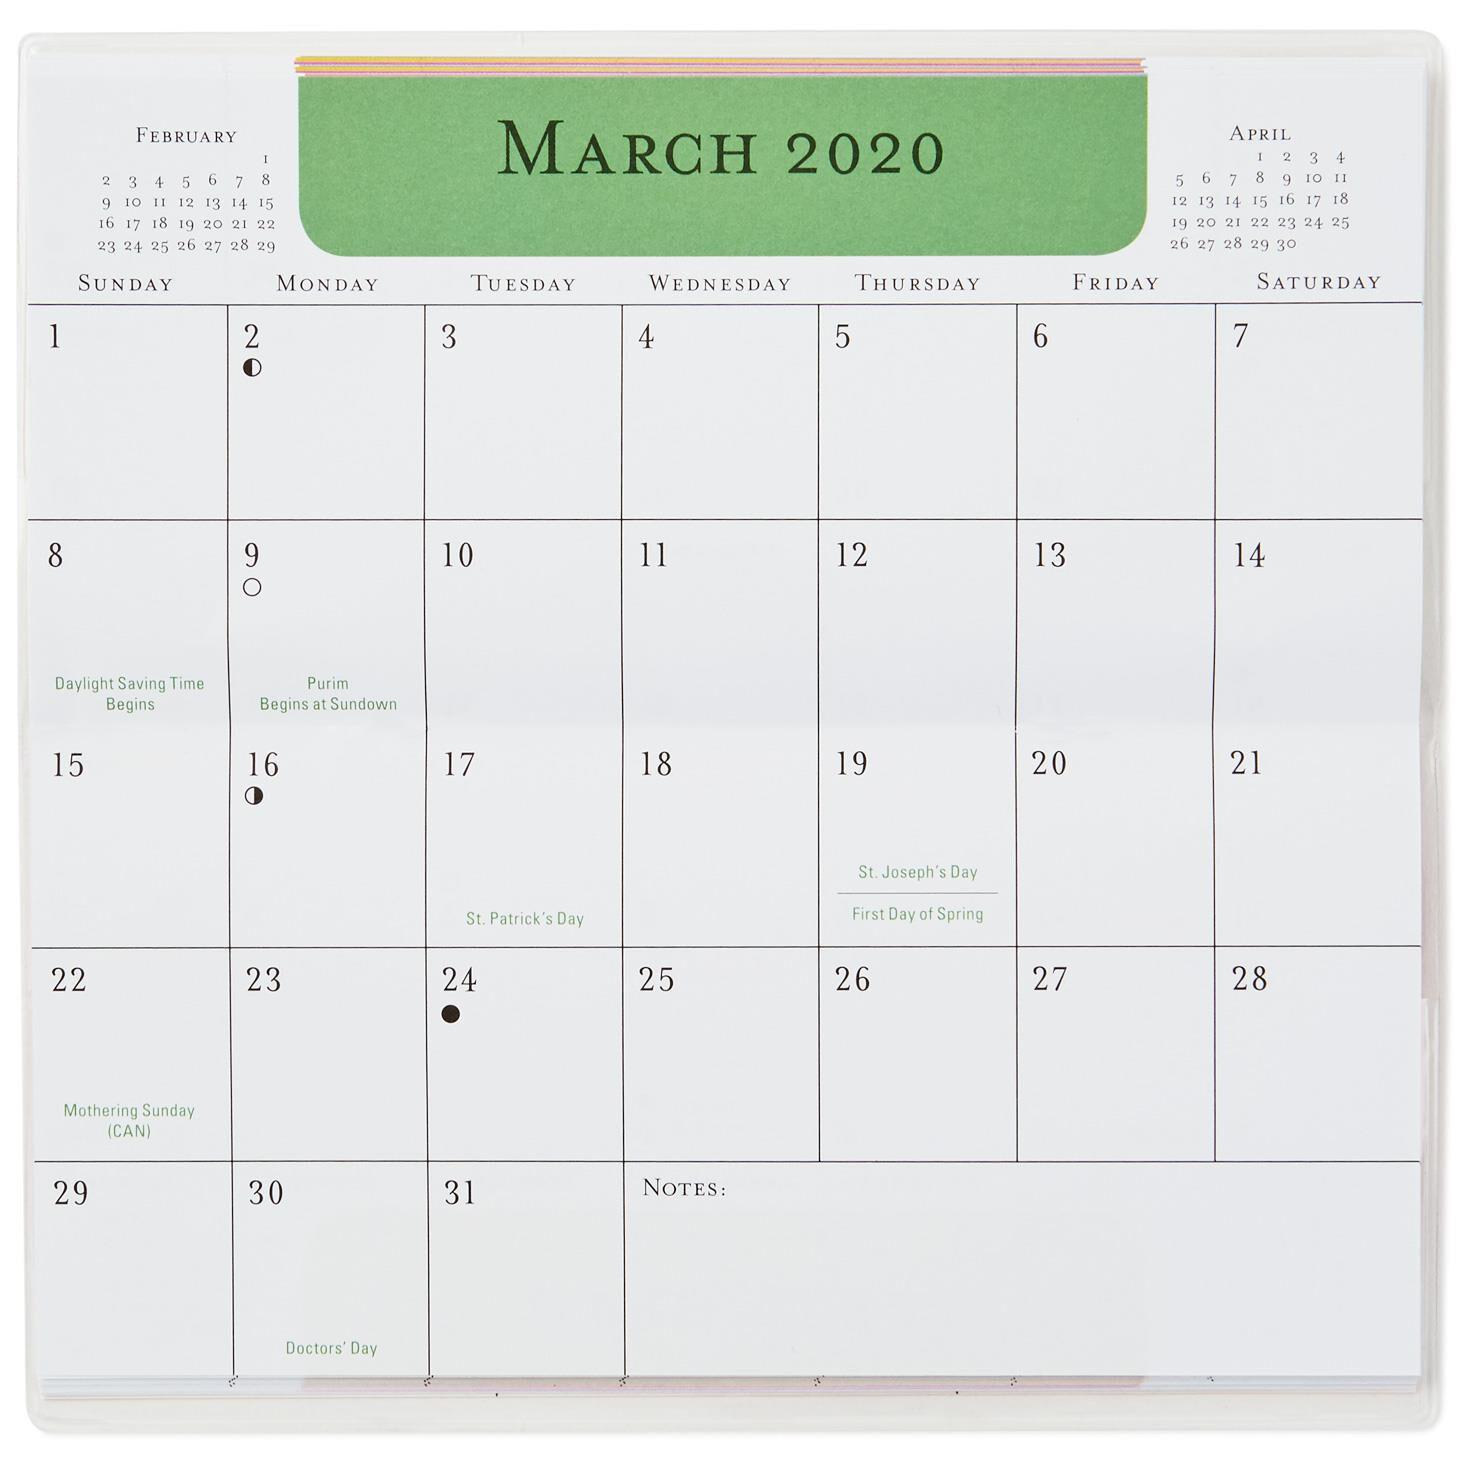 calendar planner - Ataum berglauf-verband com